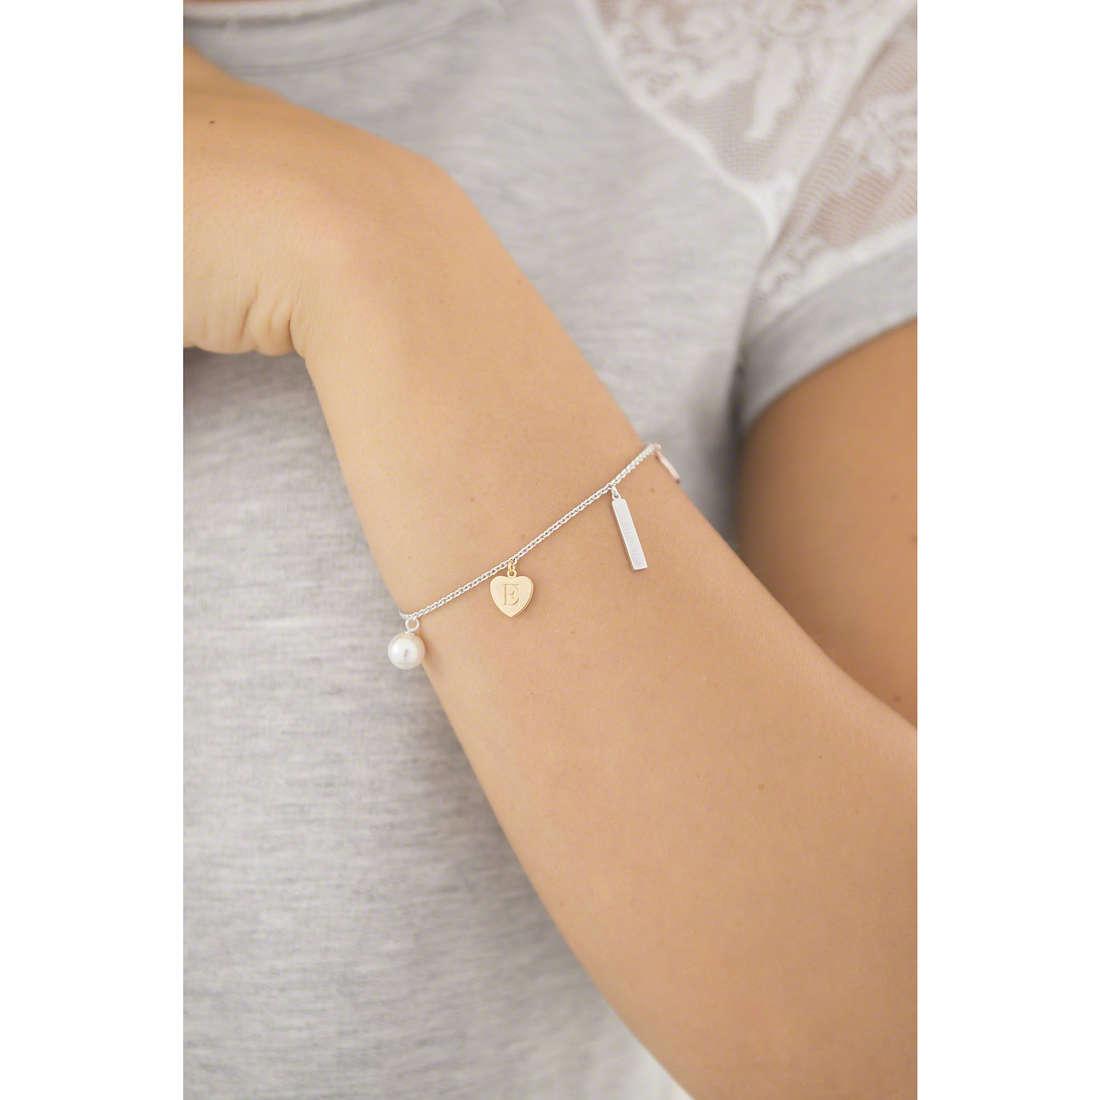 Emporio Armani bracelets woman EG3311040 indosso